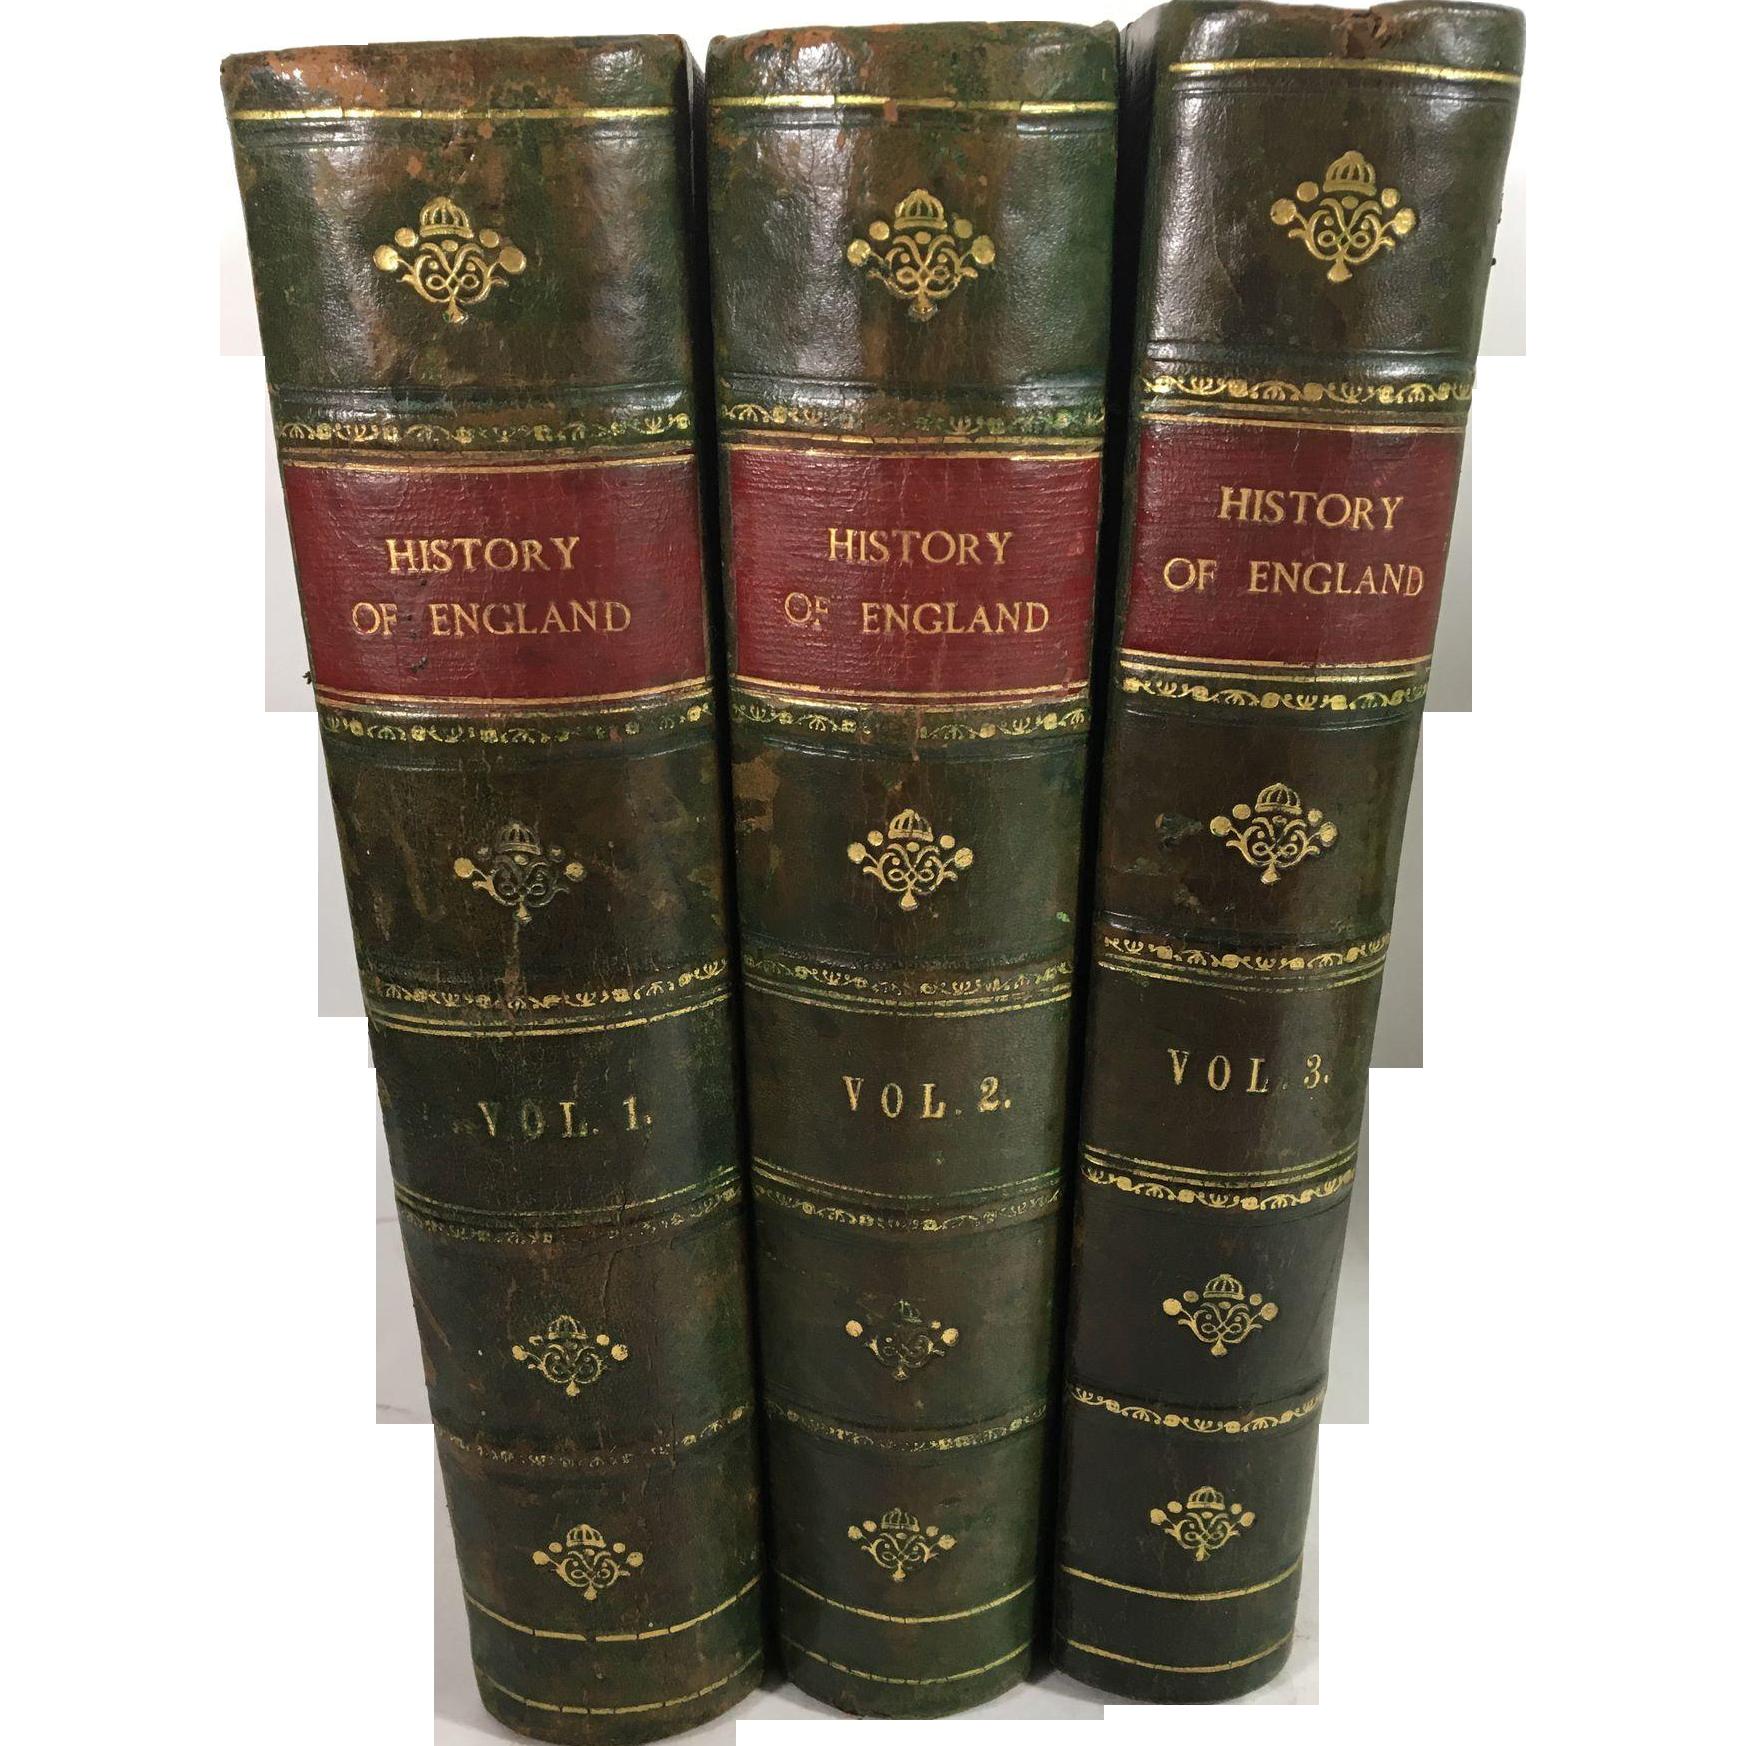 Popular History of England, Charles Macfarlane and Thomas Archer, Three Volumes, Blackie & Son, London, 1886